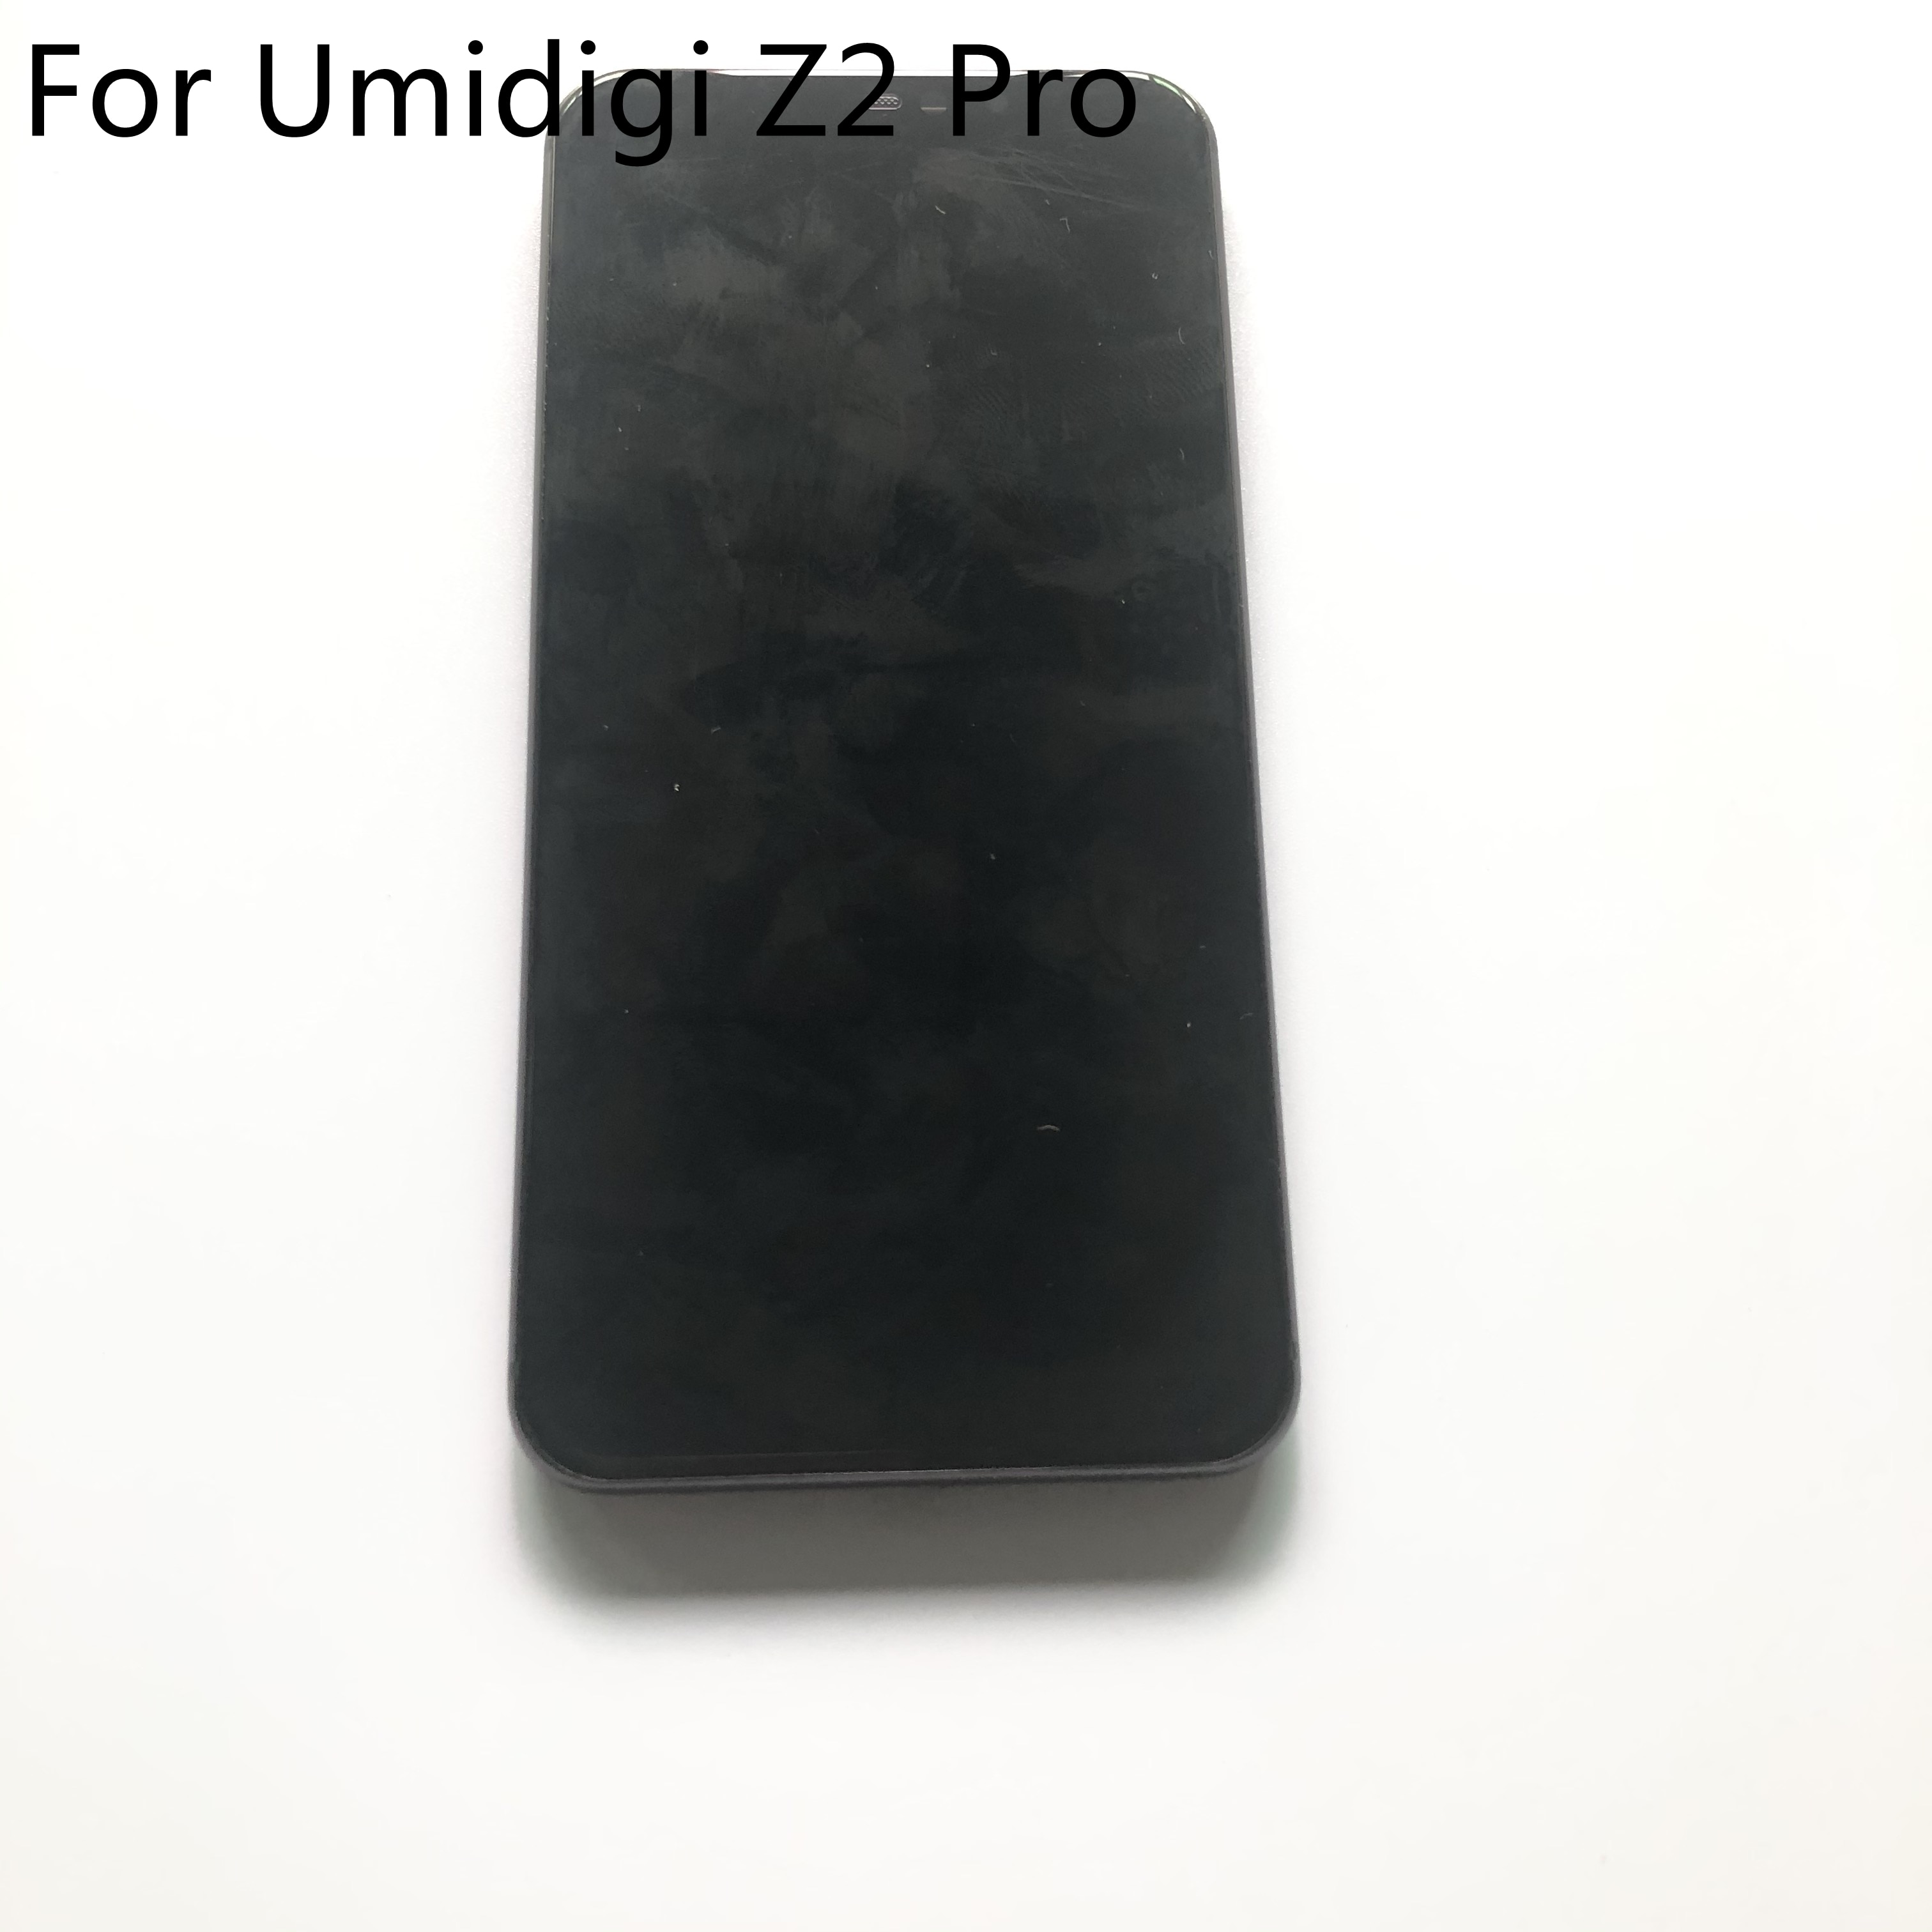 UMIDIGI Z2 Pro Used LCD Display Screen + Touch Screen + Frame For UMIDIGI Z2 Pro MTK6771 6.2 inch 2246x1080 Smartphone